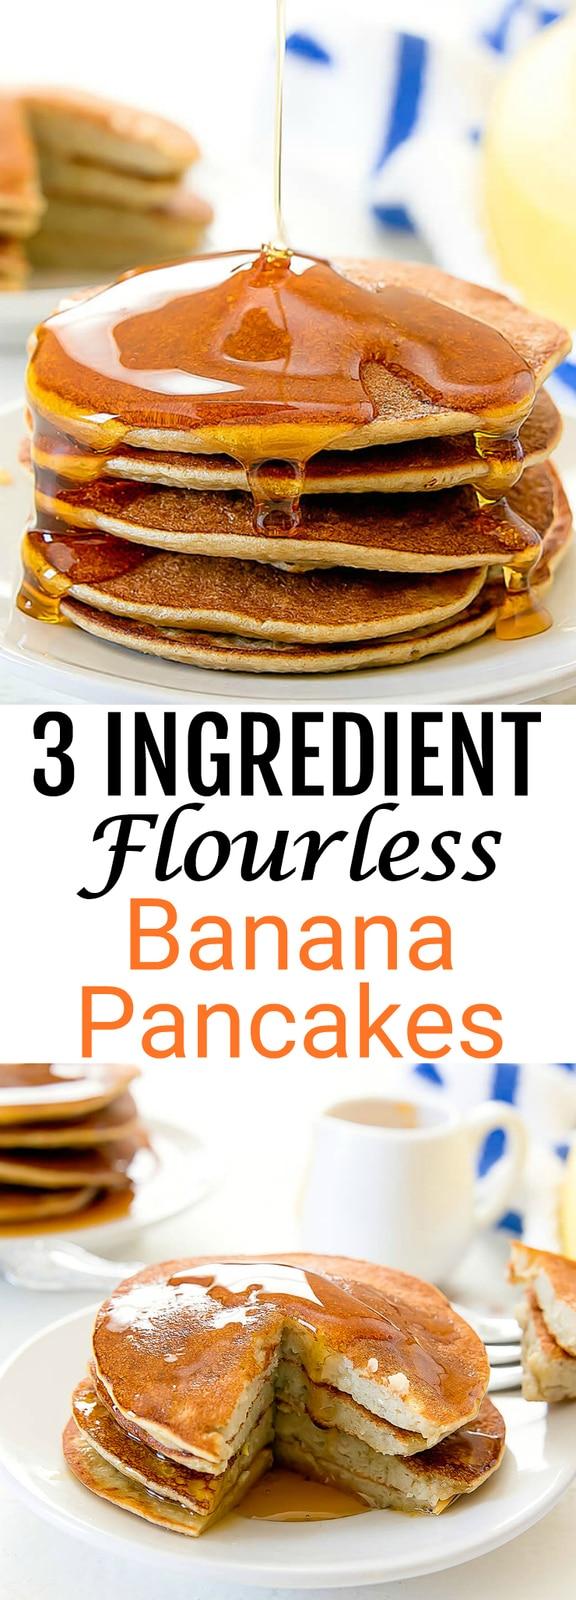 3 Ingredient Flourless Banana Pancakes. These gluten free pancakes are super easy!